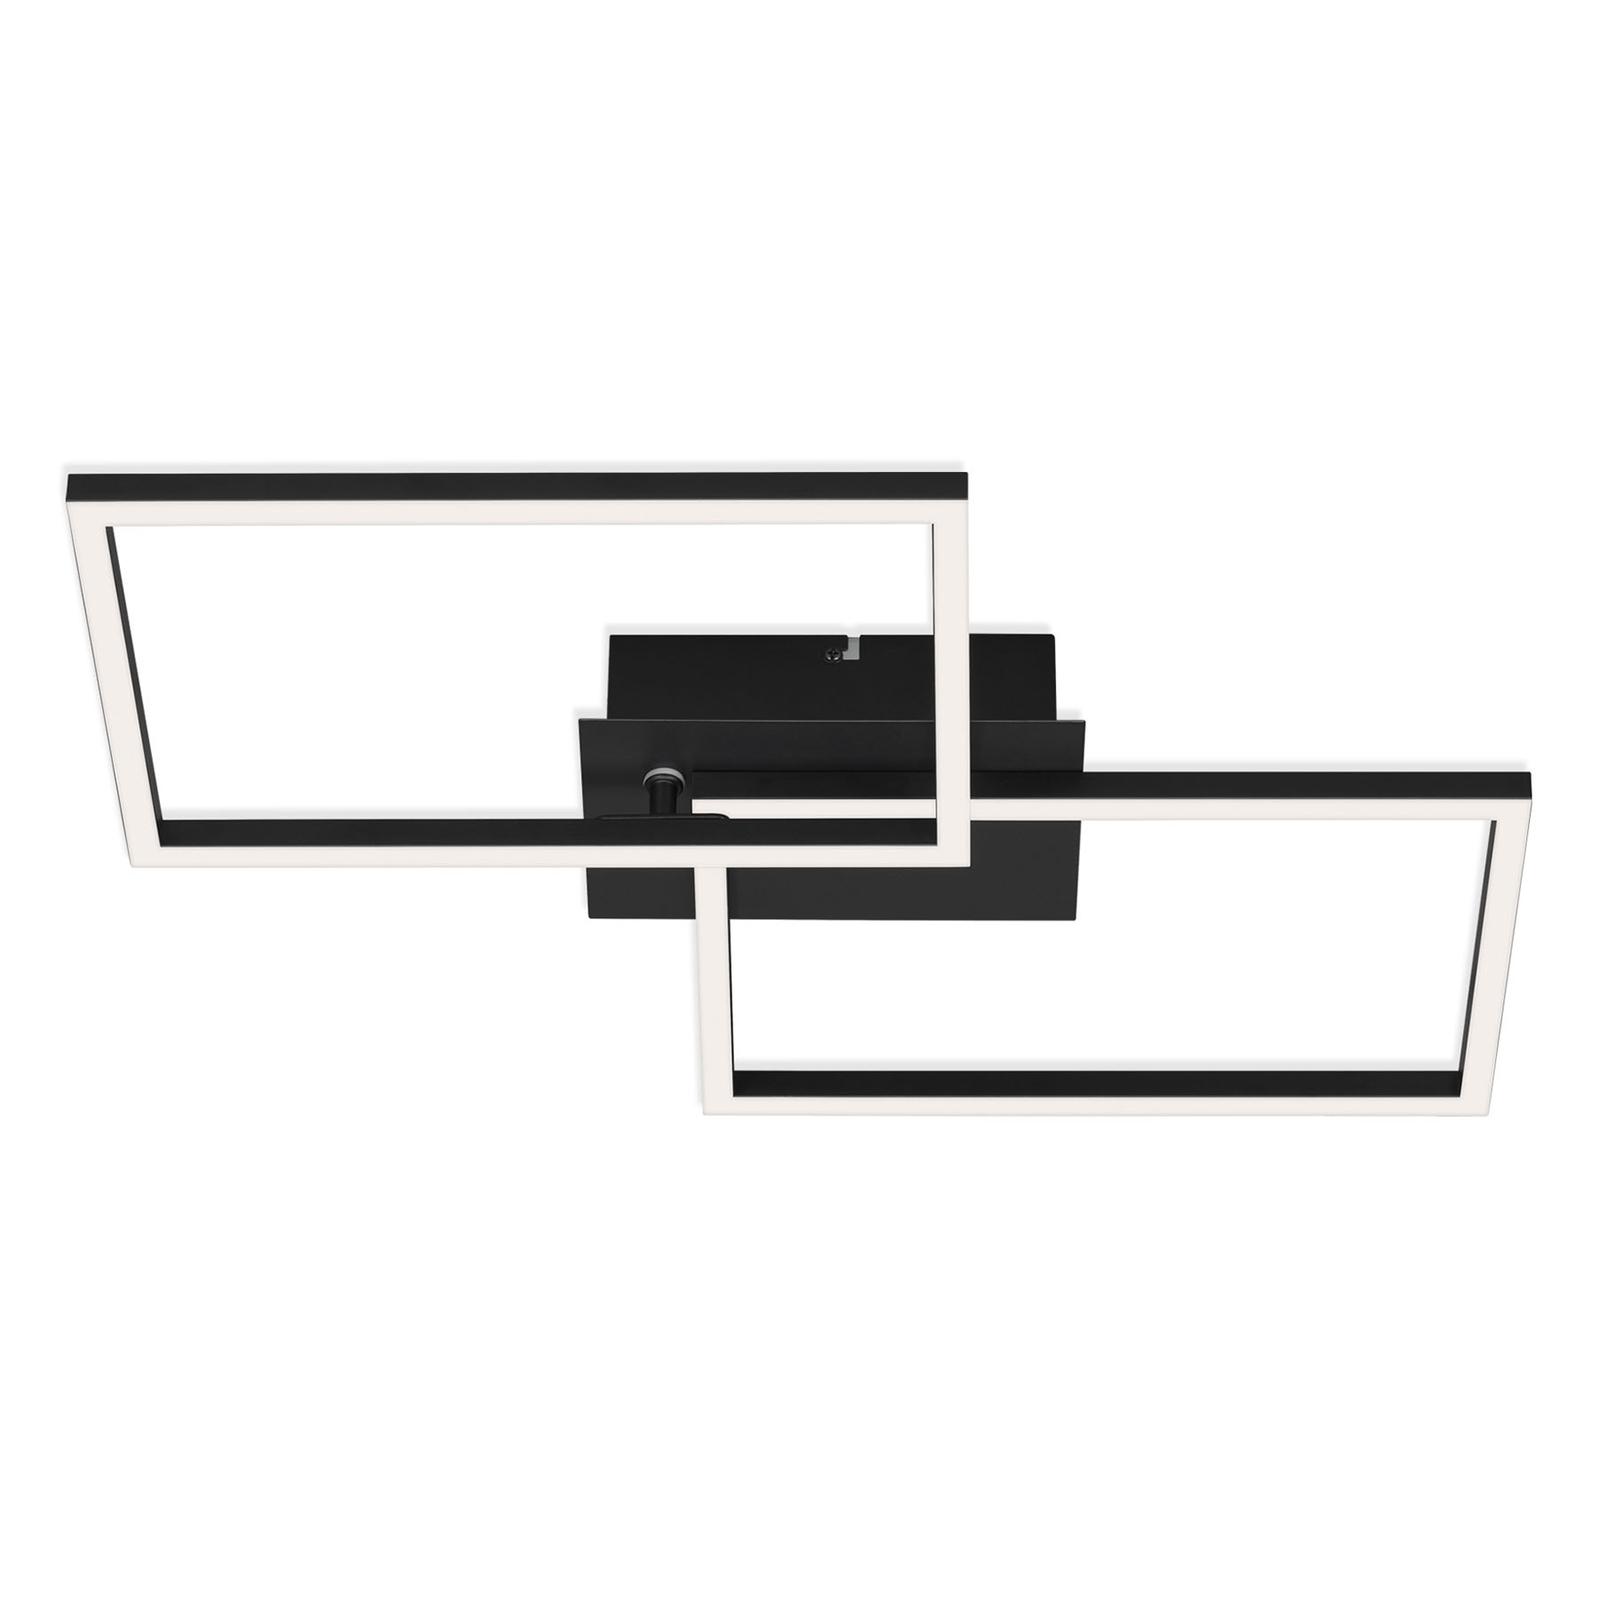 Lampa sufitowa LED Frame CCT, czarna, 50x39cm